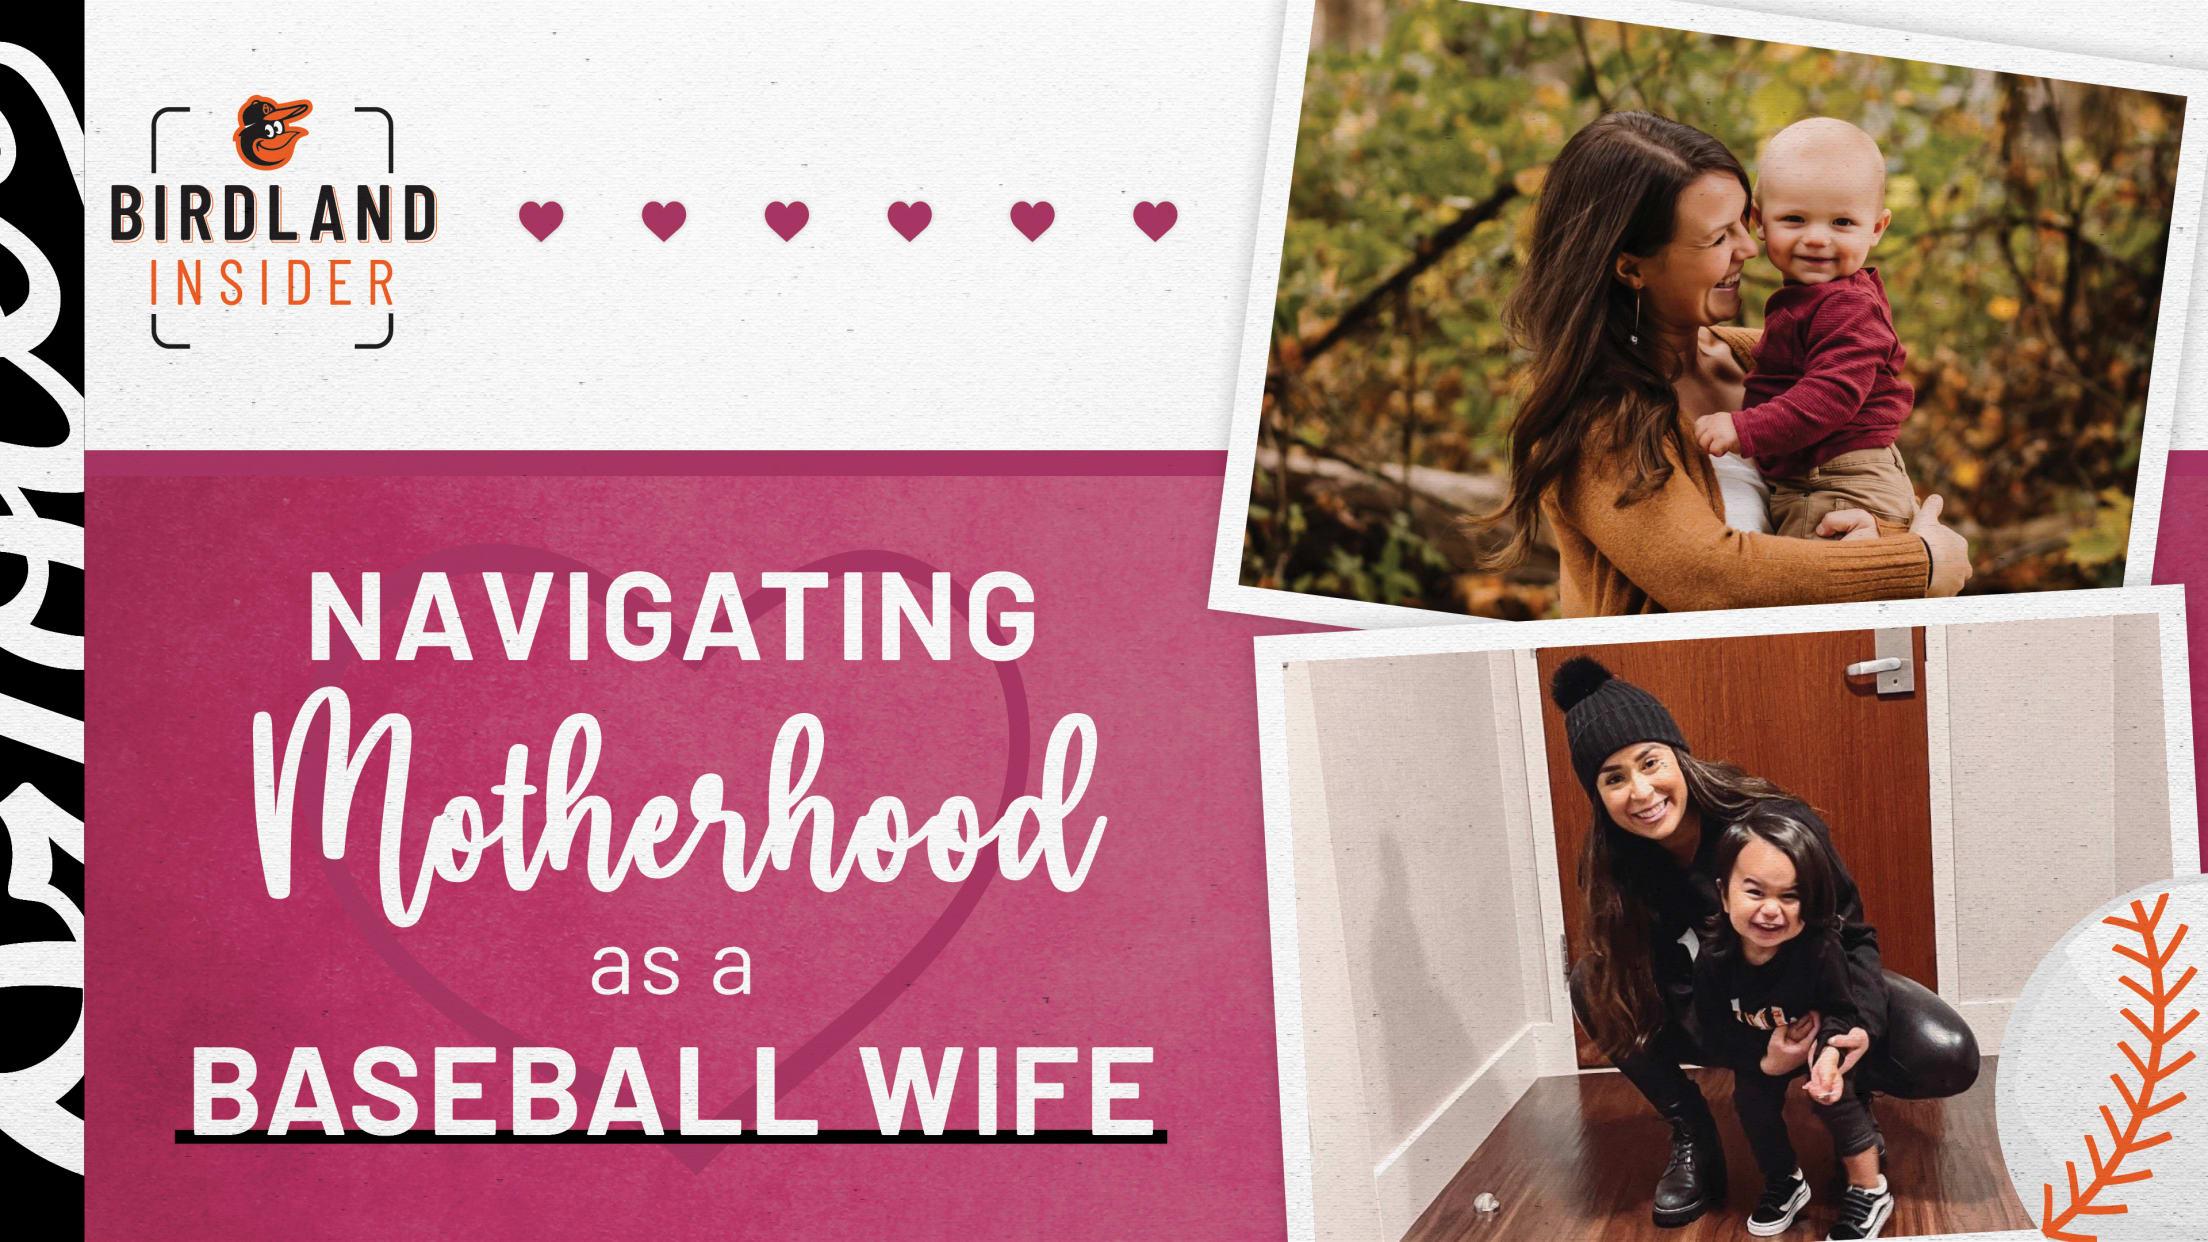 bal-balancing-motherhood-as-a-baseball-wife-header